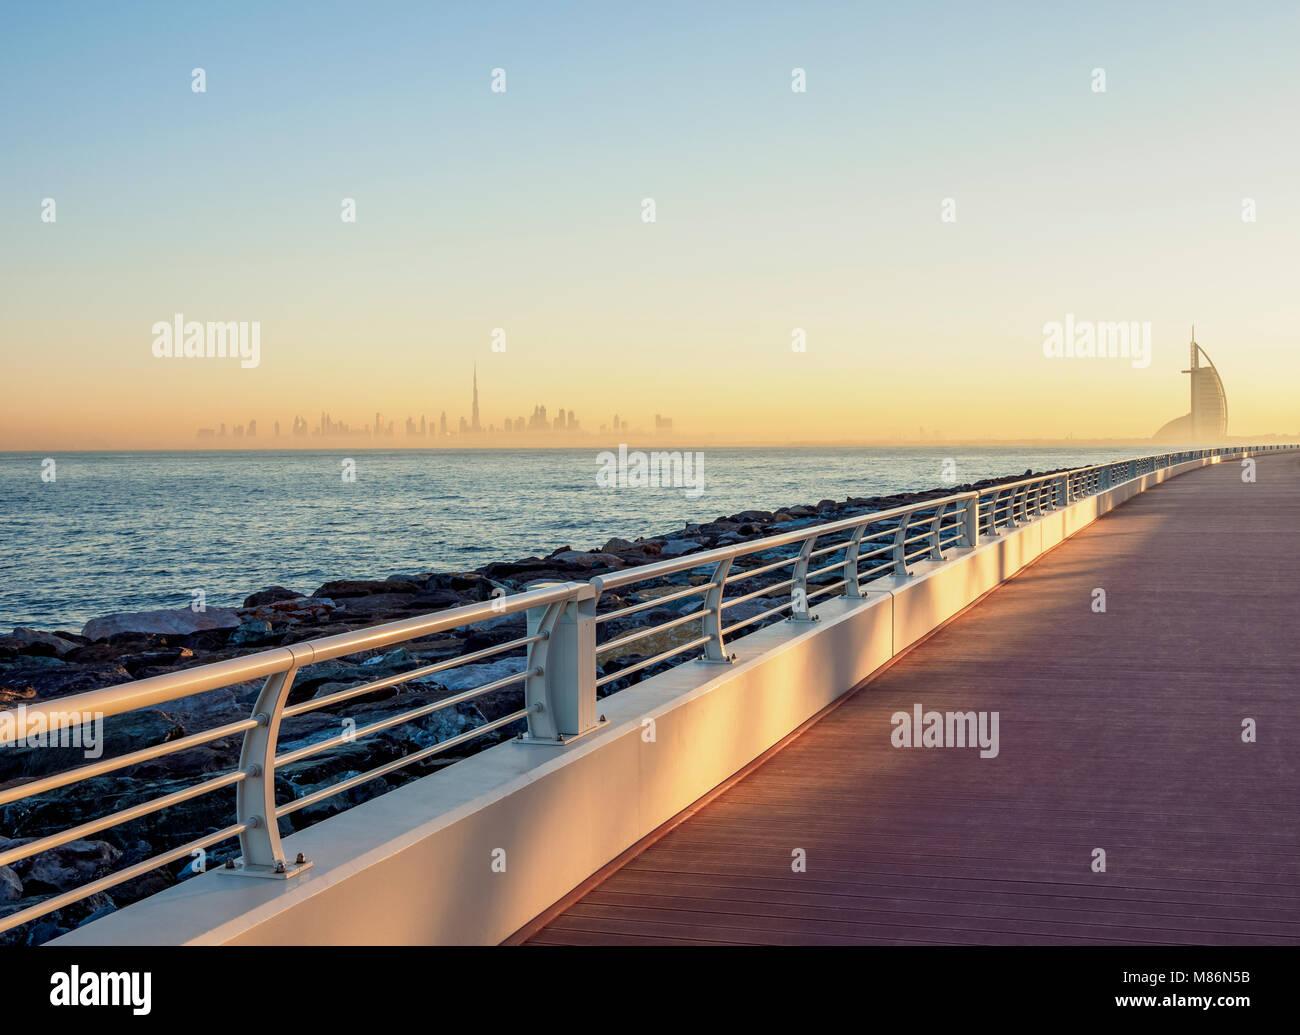 Palm Jumeirah Boardwalk e centro città Skyline di sunrise, Dubai, Emirati Arabi Uniti Immagini Stock